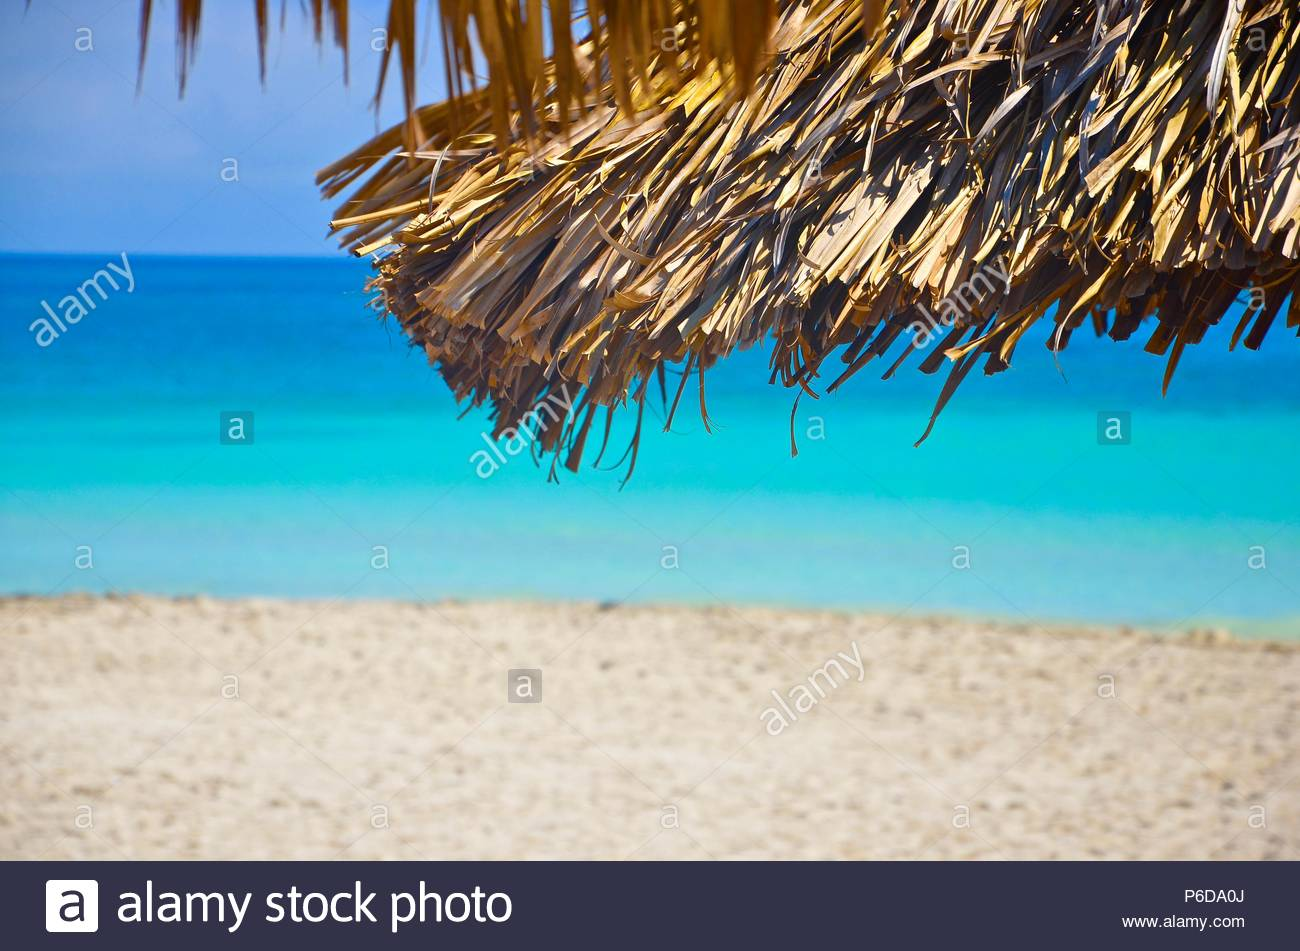 Tourquoise Caribbean sea on Varadero beach in Cuba, shellfish, hand, sun, vacation, palm trees, sand, waves, horizon, landscape, woman's hand - Stock Image